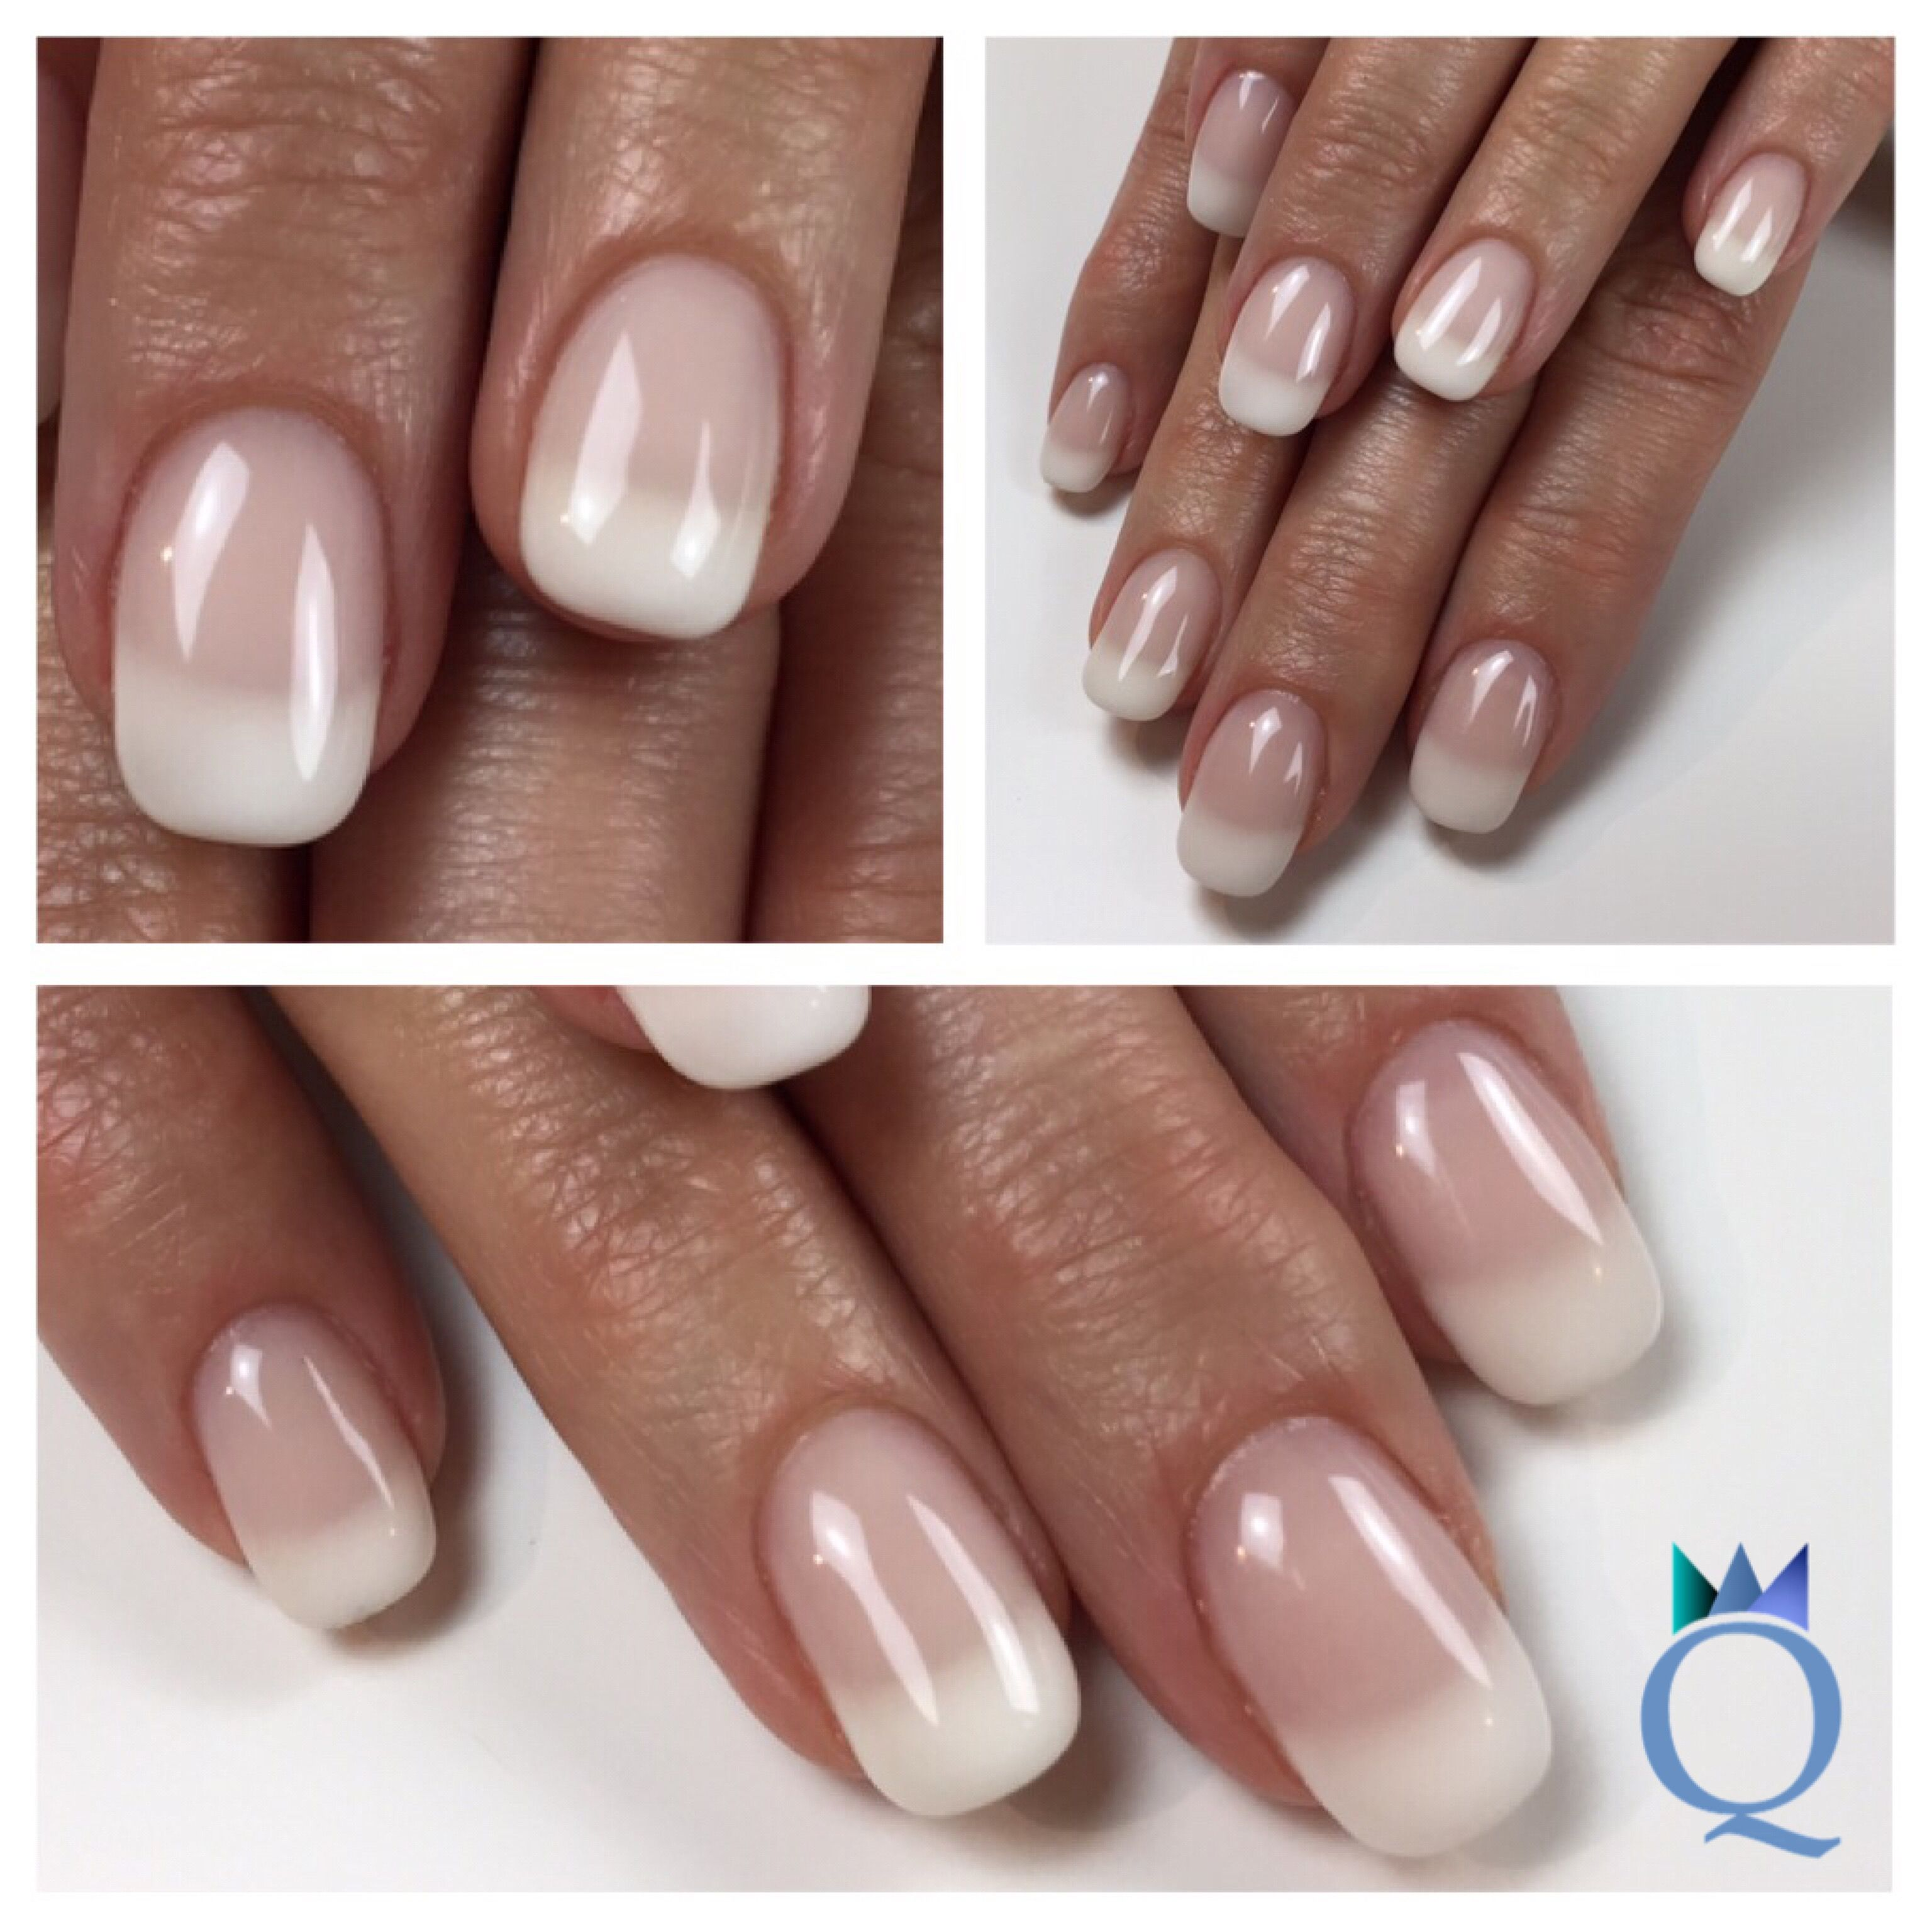 shortnails #gelnails #nails #frenchnails #kurzenägel #gelnägel ...